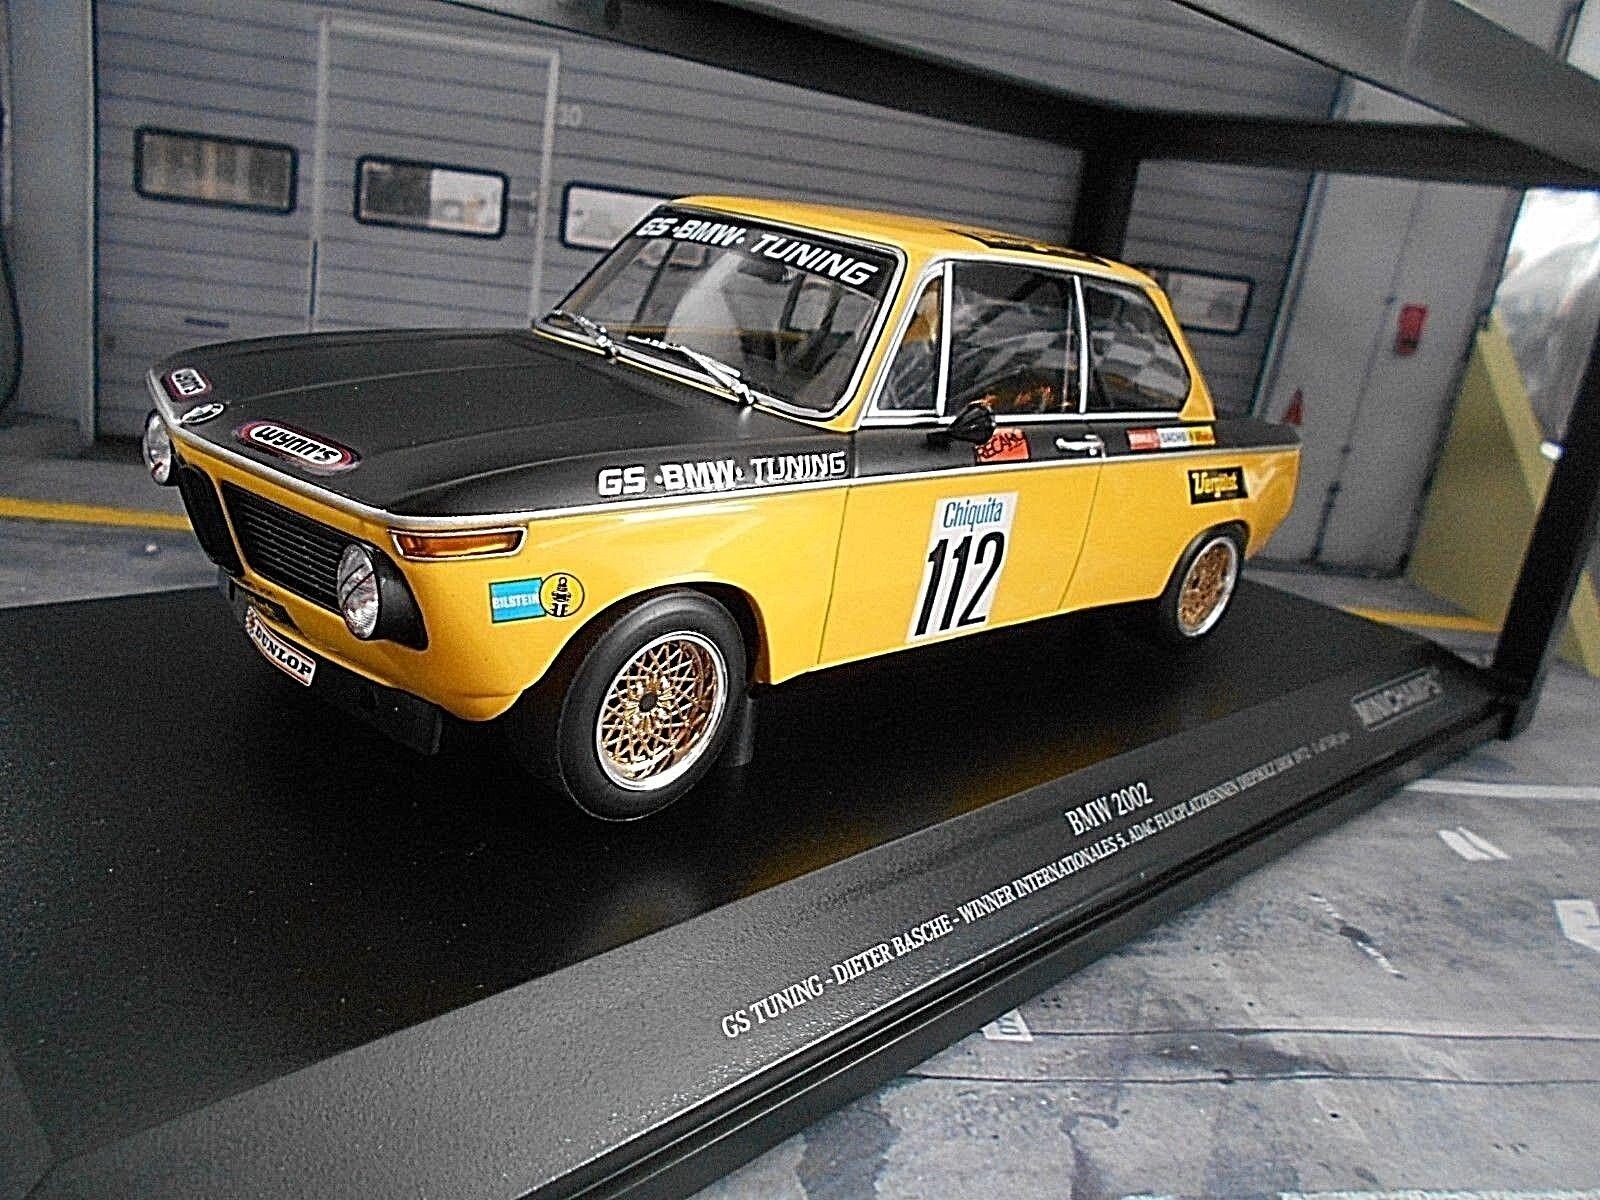 BMW 2002 GS Tuning DRM Diepholz 1972  112 Basche Winner vergölst MINICHAMPS 1 18